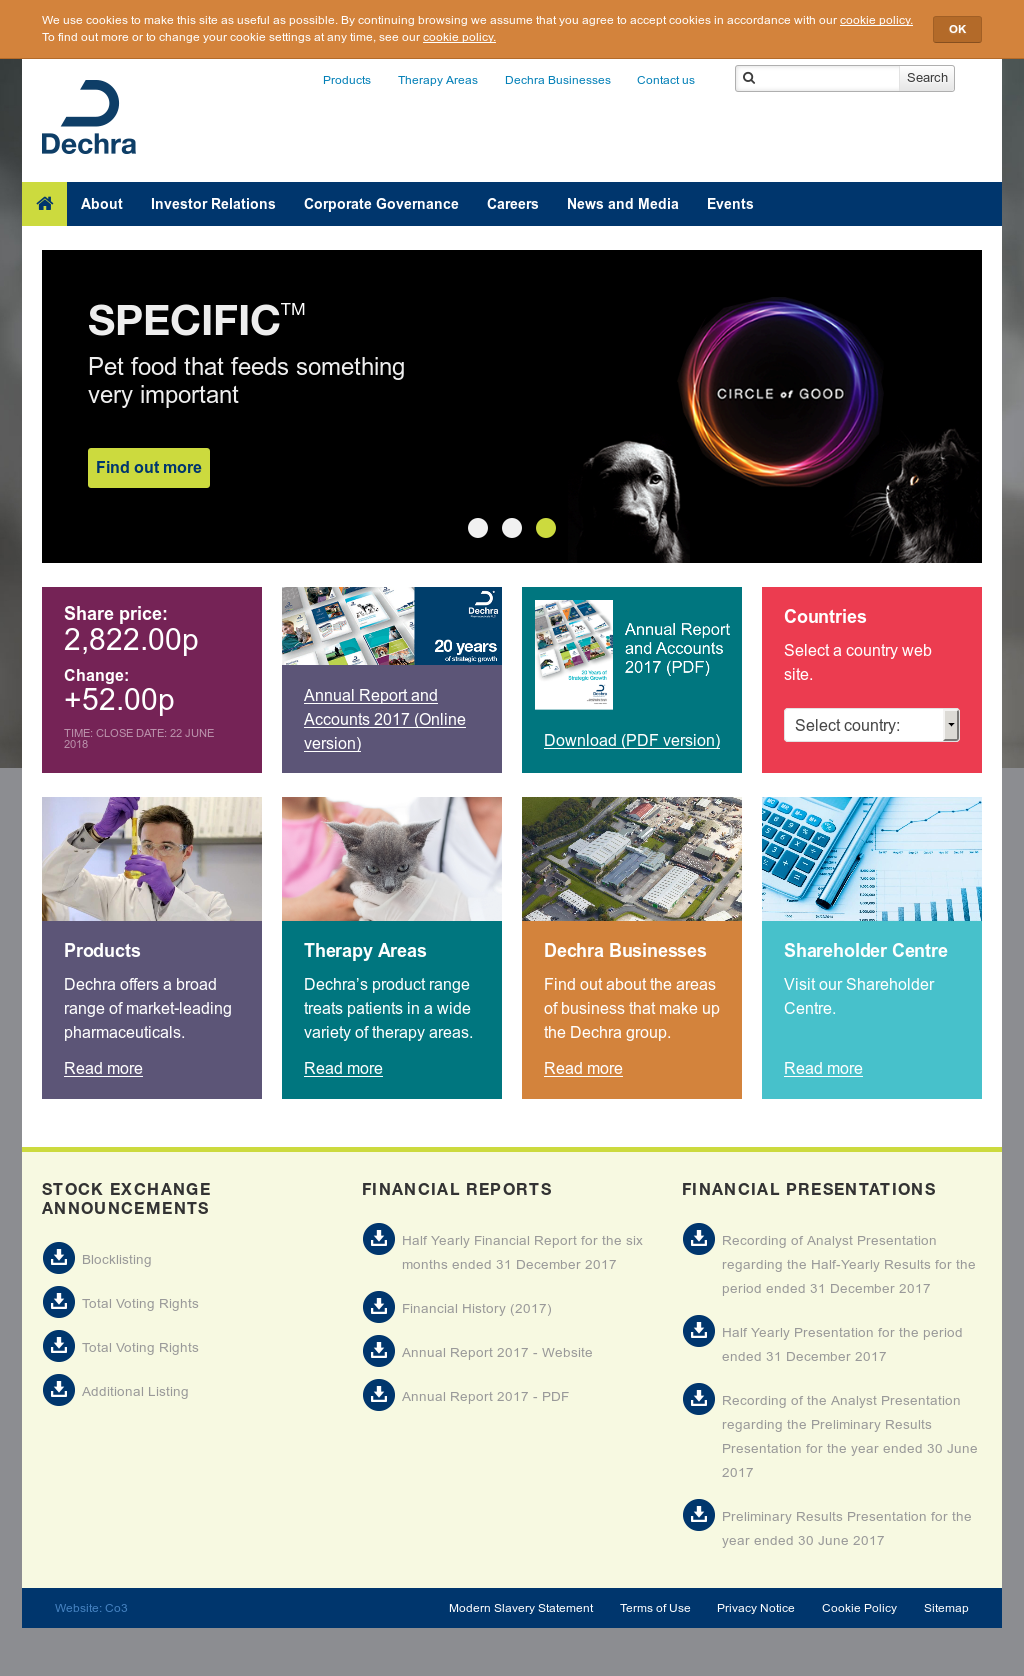 Dechra Competitors, Revenue and Employees - Owler Company